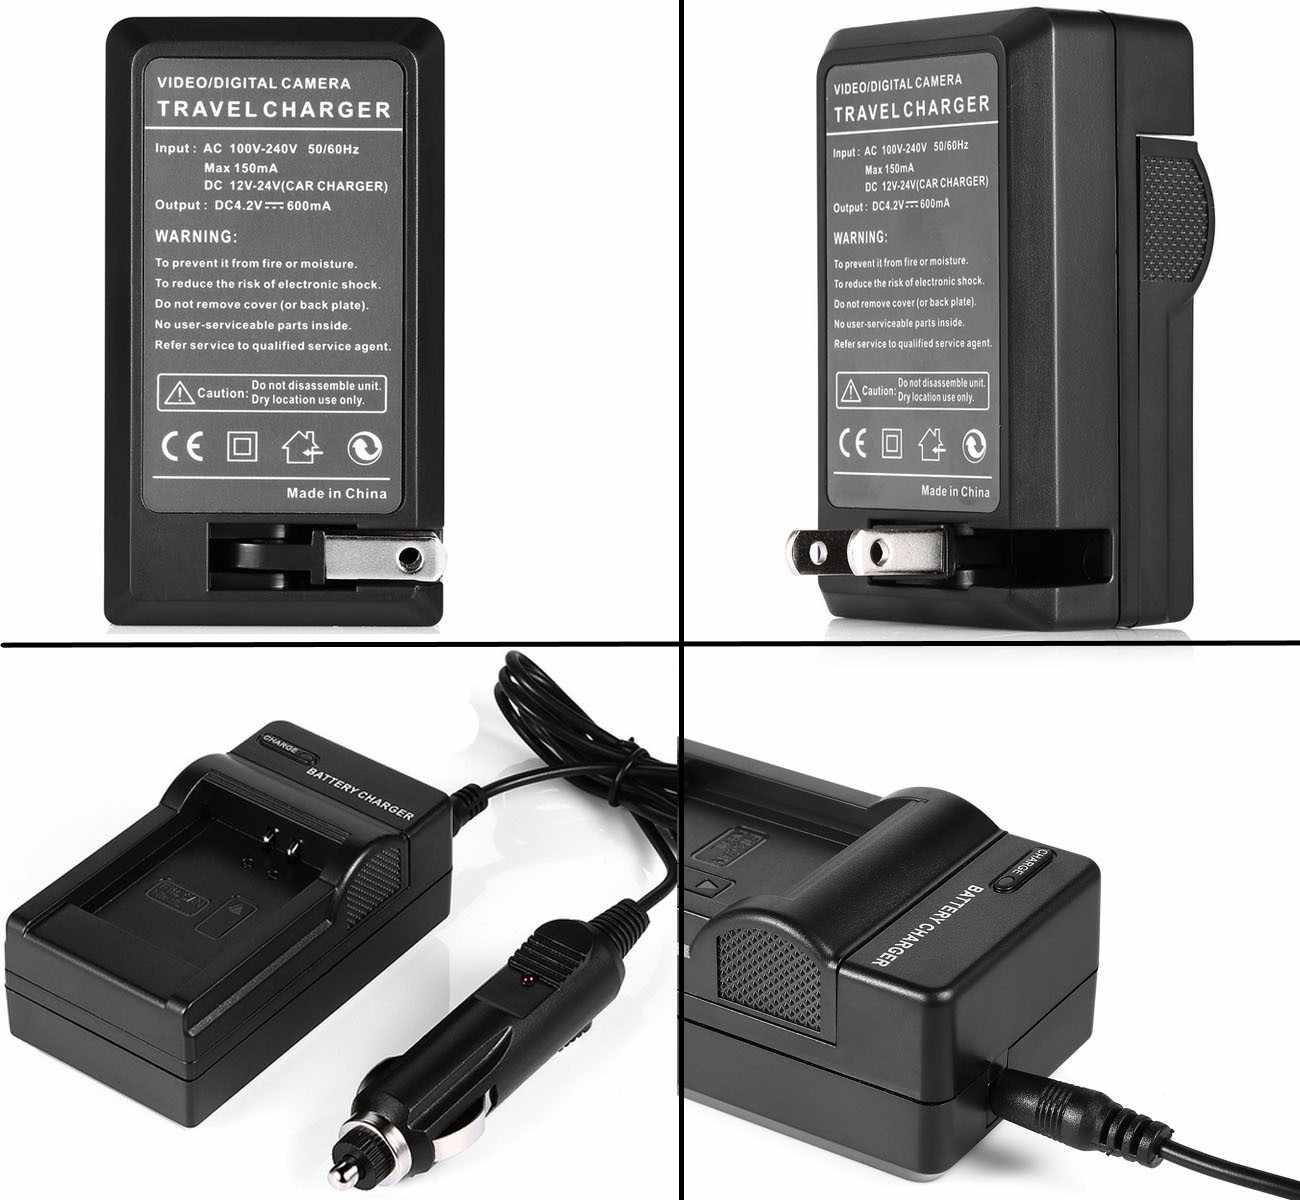 Batería + cargador para cámara Digital Sony cyber-shot DSC-RX1RII, DSC-RX100III, DSC-RX100IV, DSC-RX100VA, DSC-RX100VI, DSC-RX100